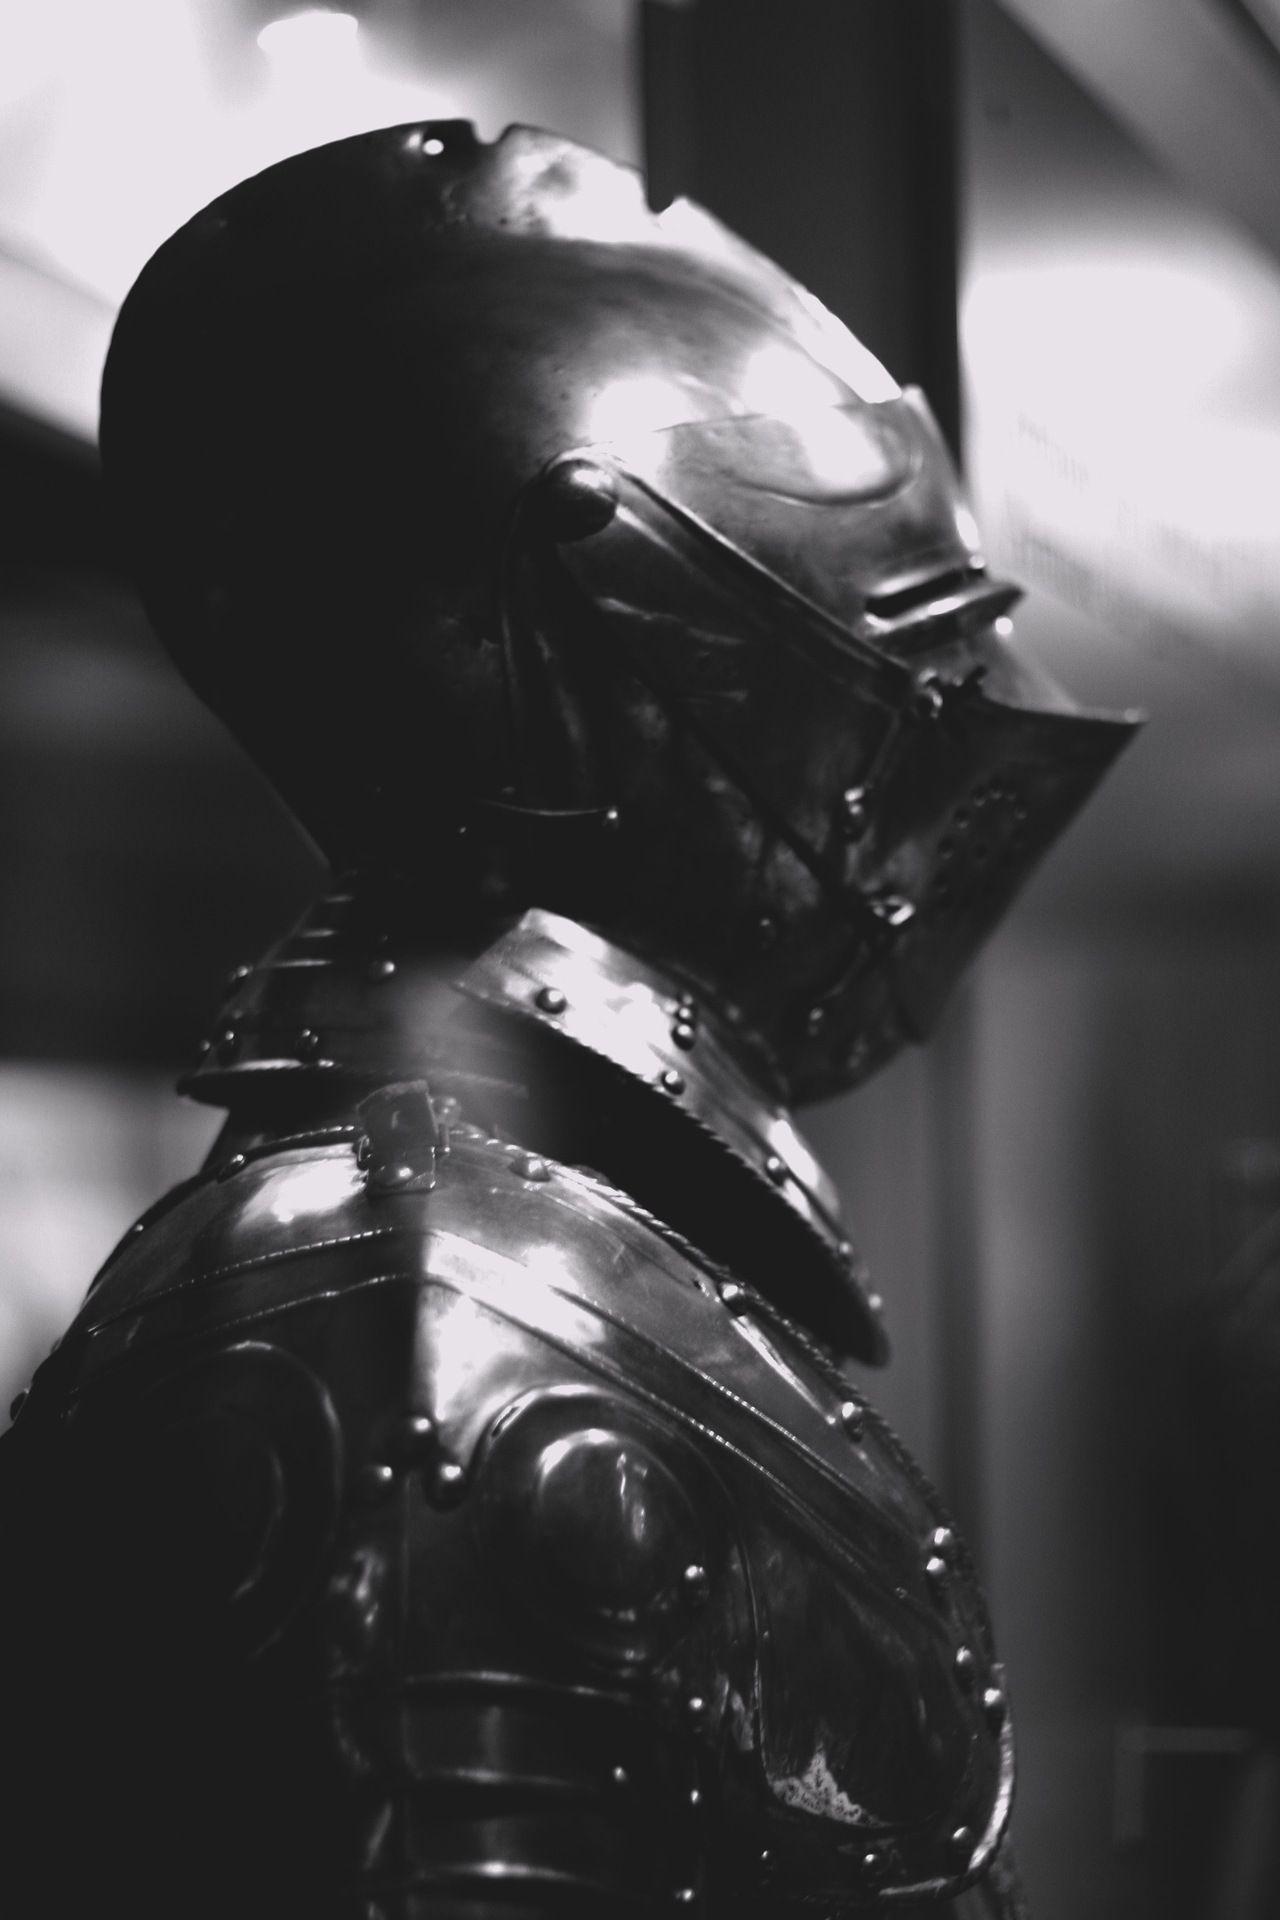 14th century armor